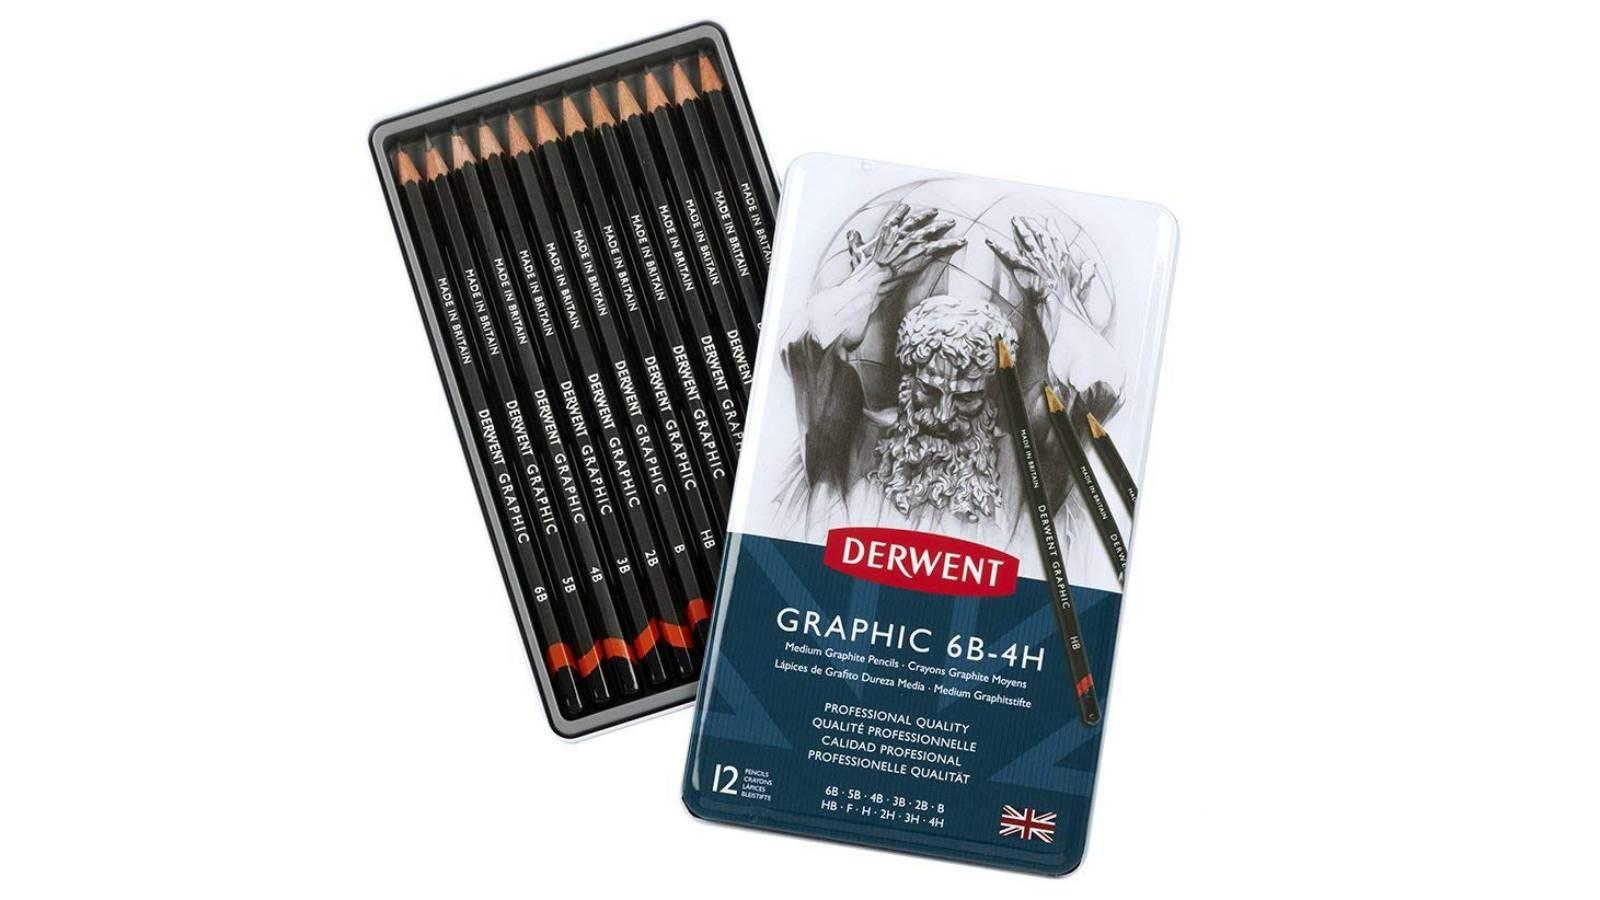 Derwent Graphic Drawing Pencils